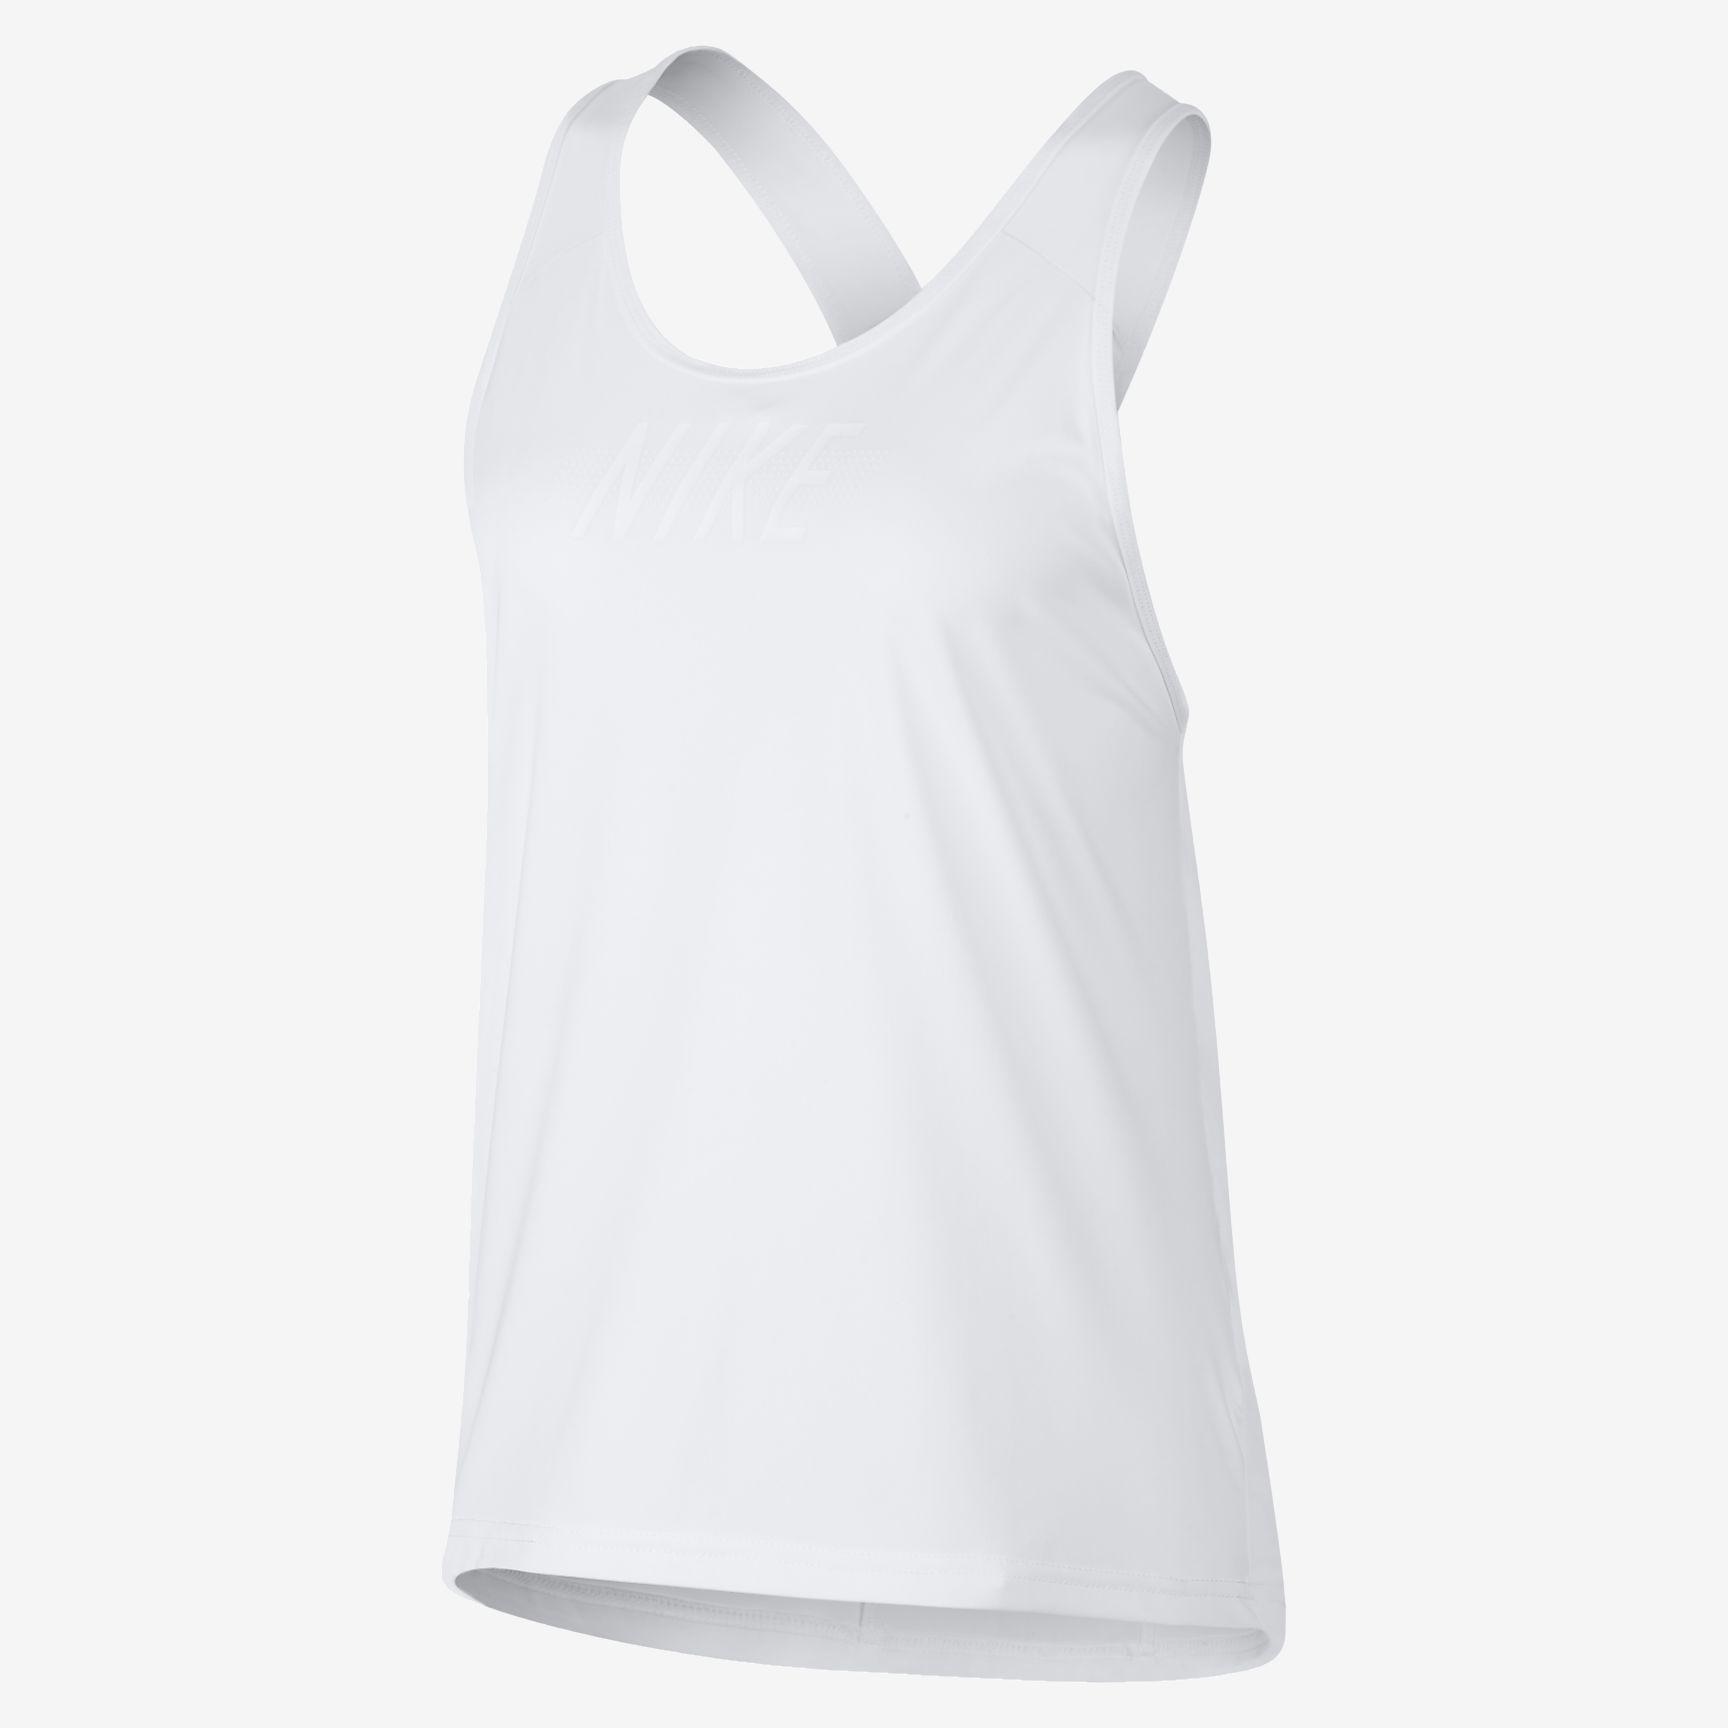 Nike Wmns Dri-FIT Flow Training Tank Top - SPORTING GOODS Sports Shirts  6f2c3e25b